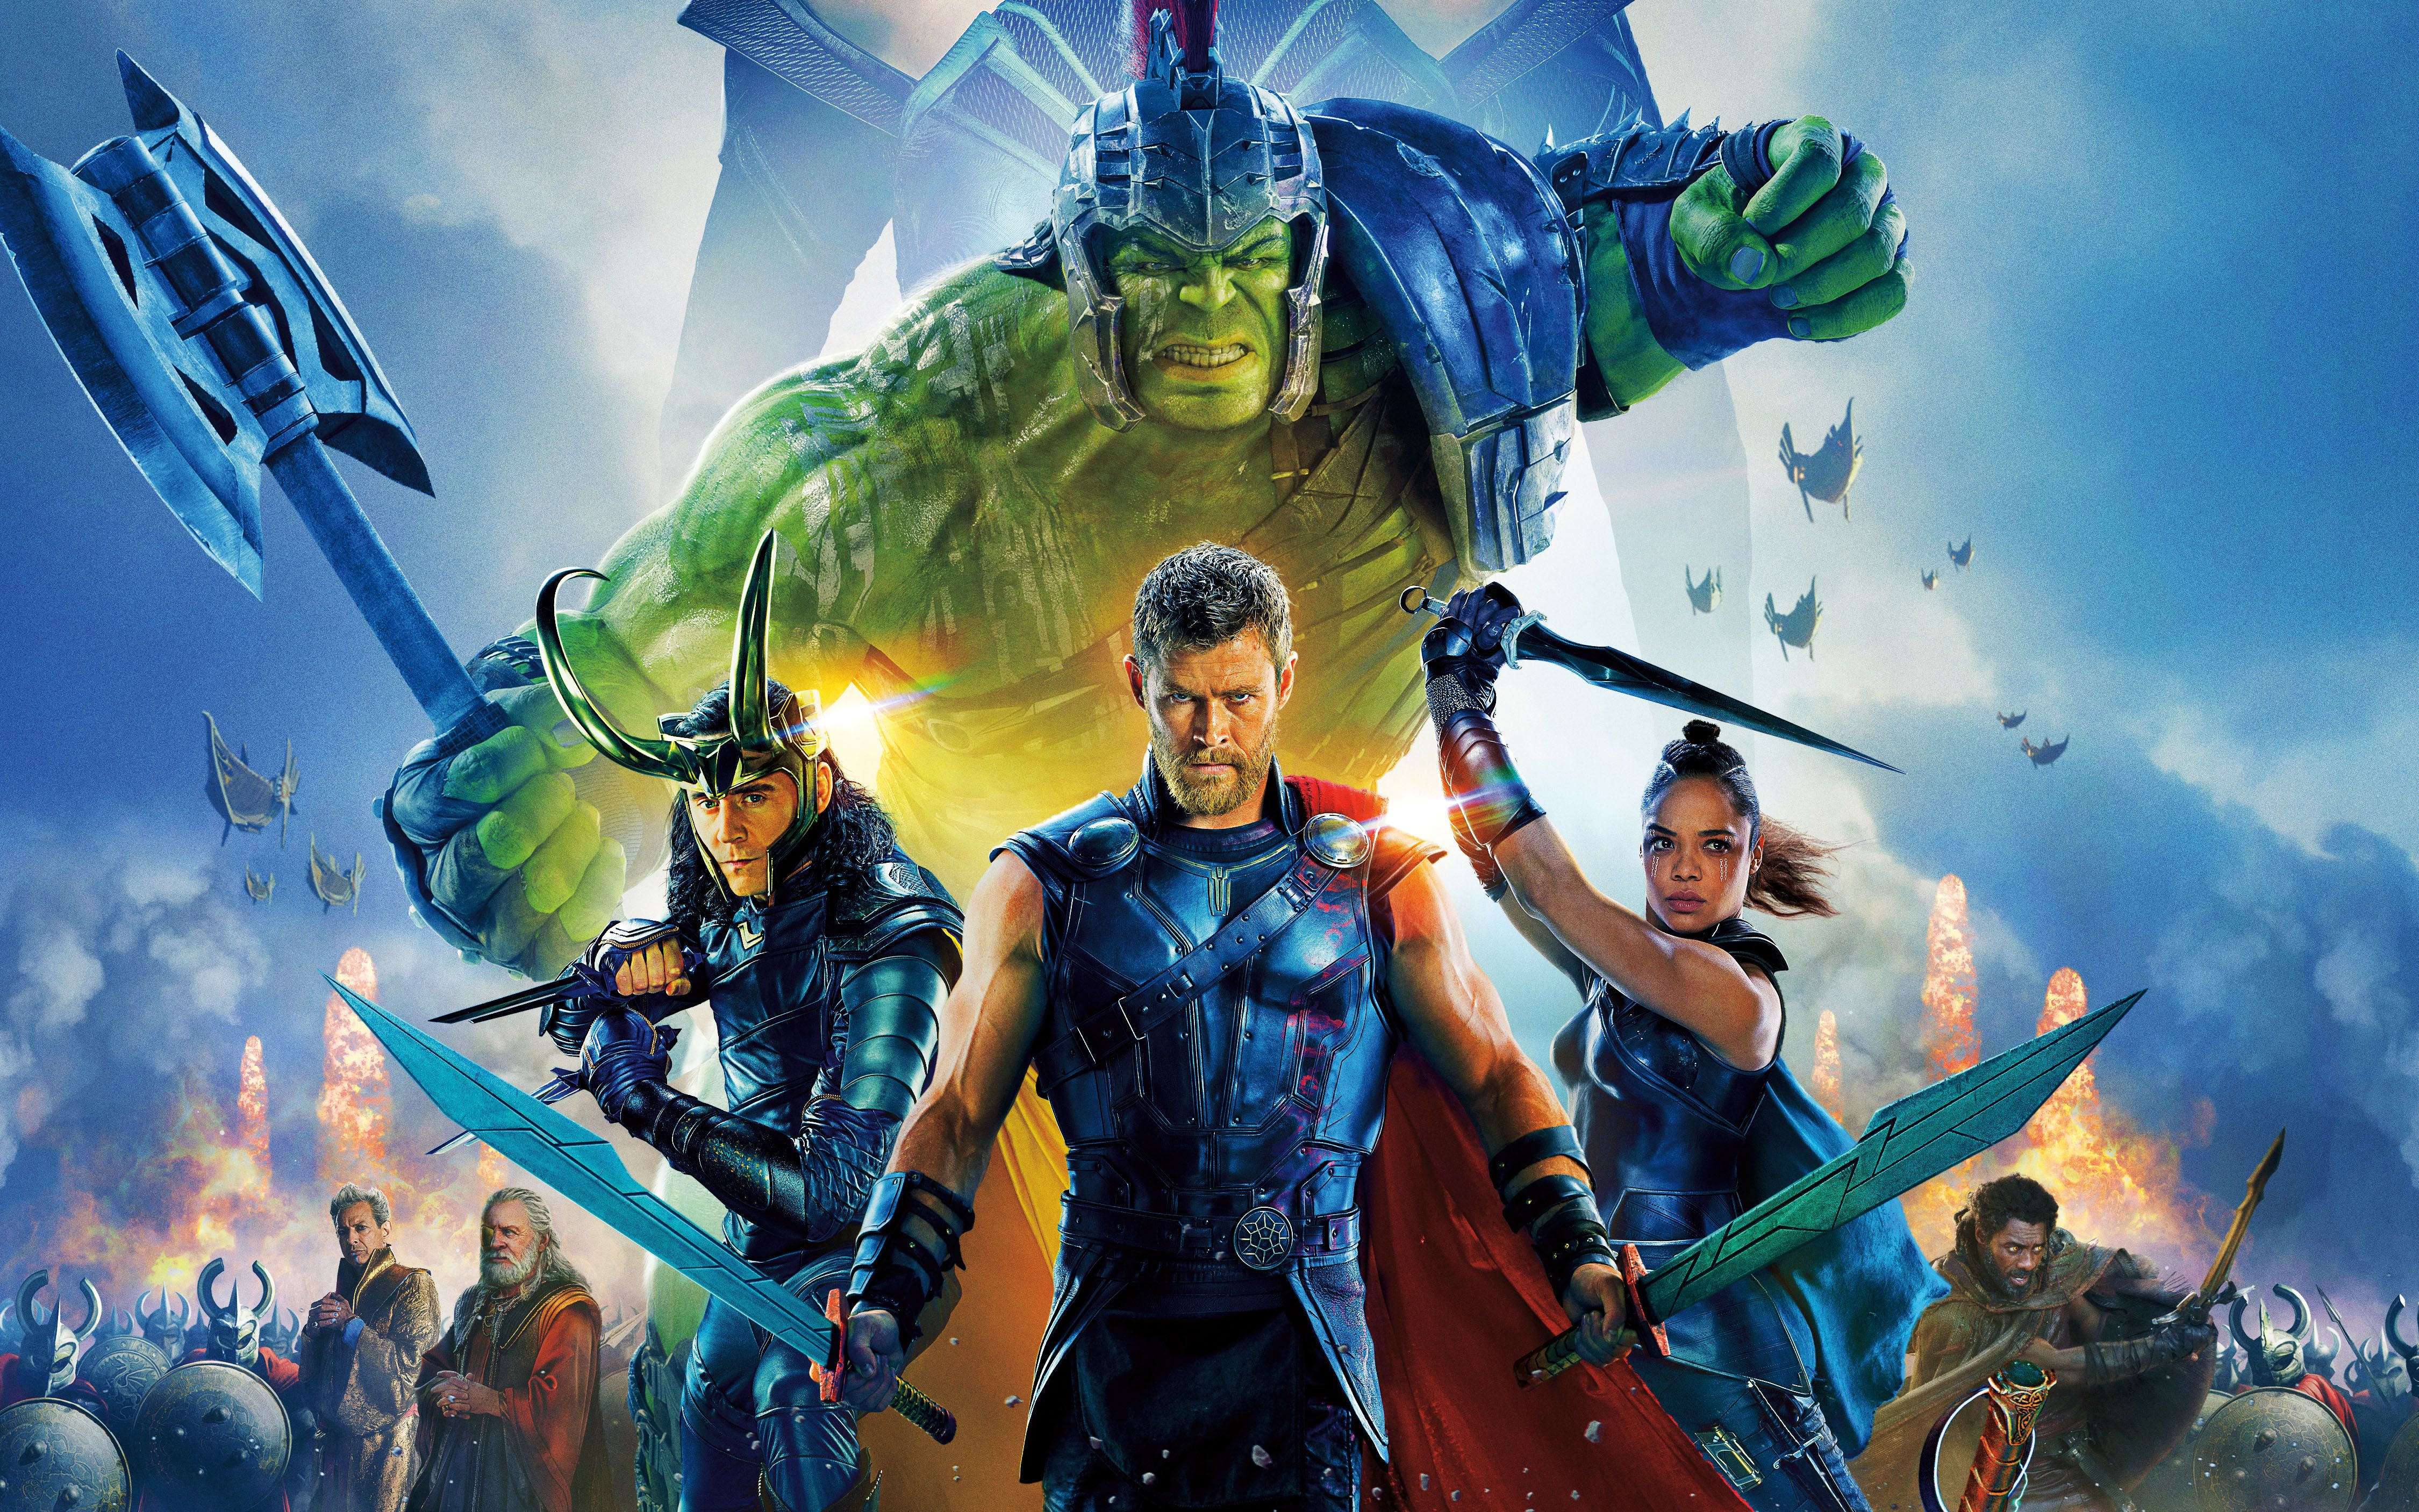 Thor Ragnarok Wallpapers Top Free Thor Ragnarok Backgrounds